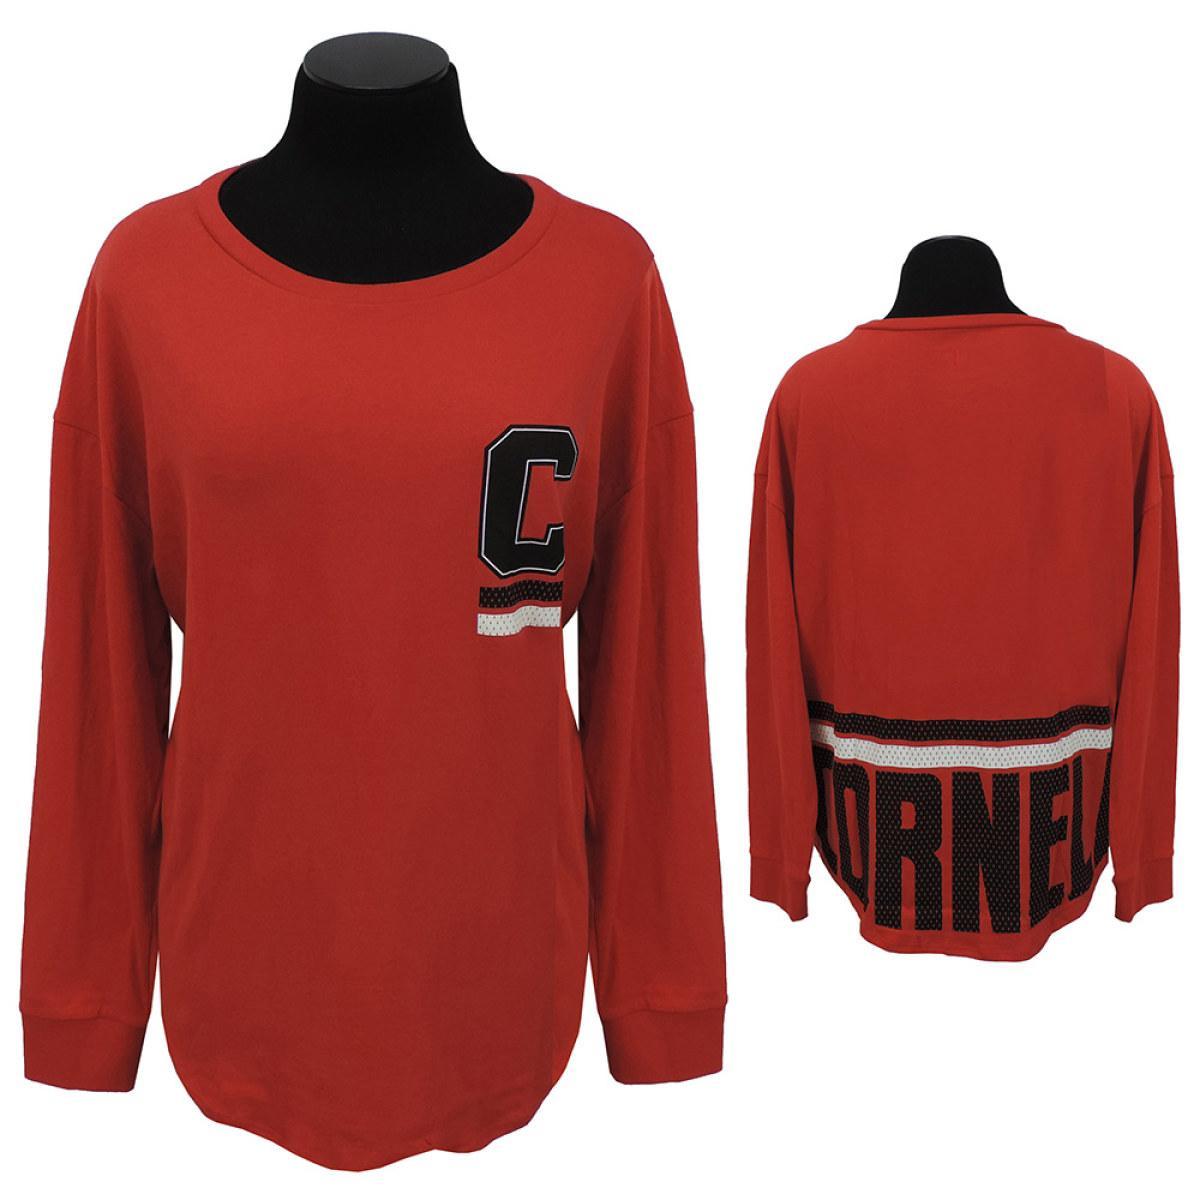 ddb33ec25b54 Women s Long Sleeve Tee - Cornell On Back - Red